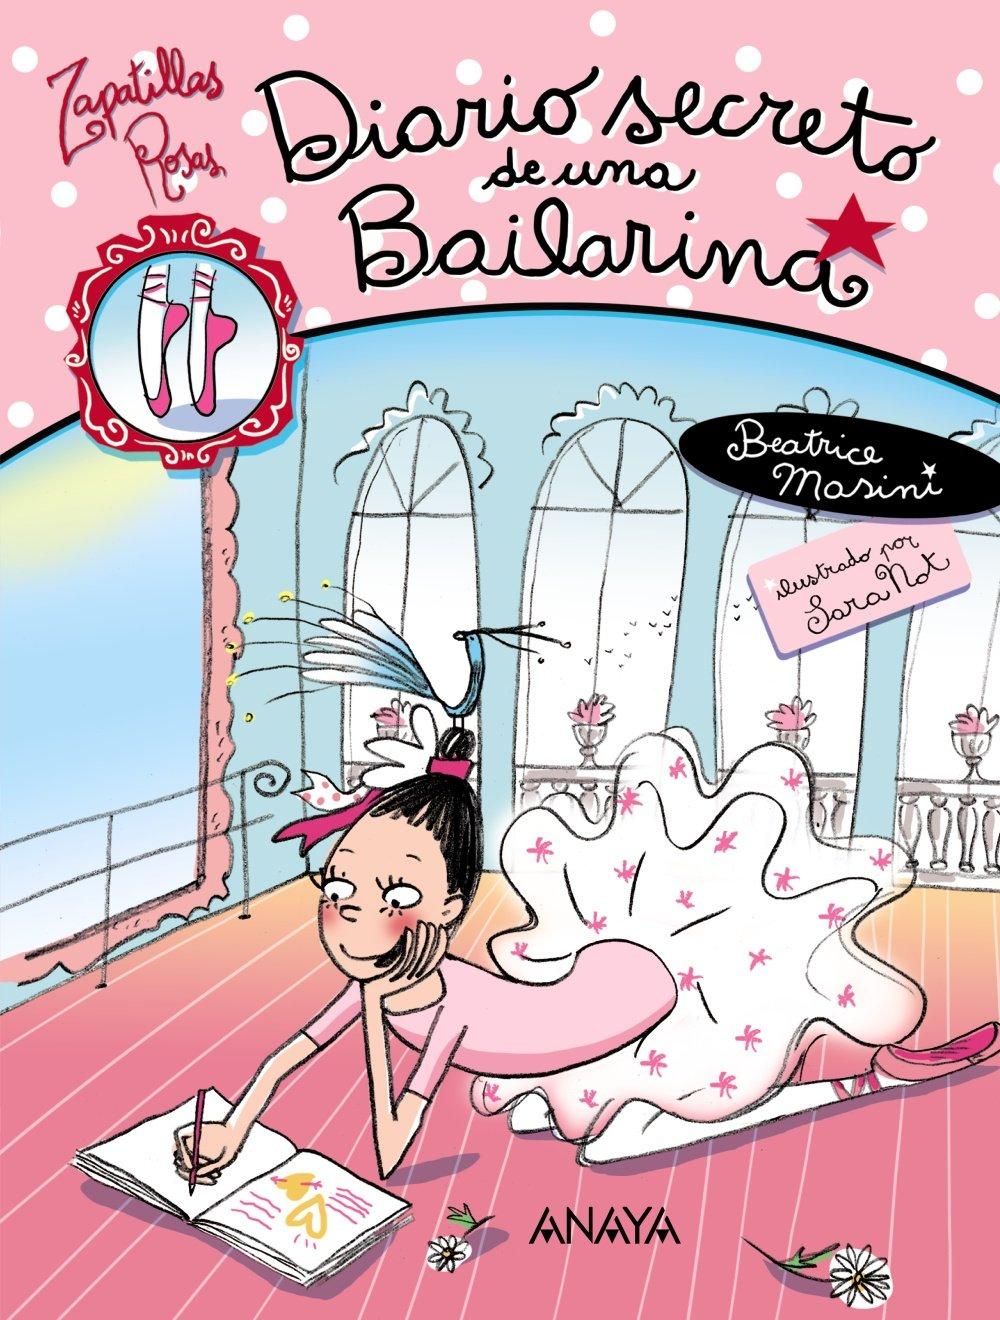 Diario secreto de una bailarina / Secret Diary of a Dancer (Zapatillas Rosas / Pink Ballet Shoes) (Spanish Edition) (Spanish) Hardcover – July 30, 2009